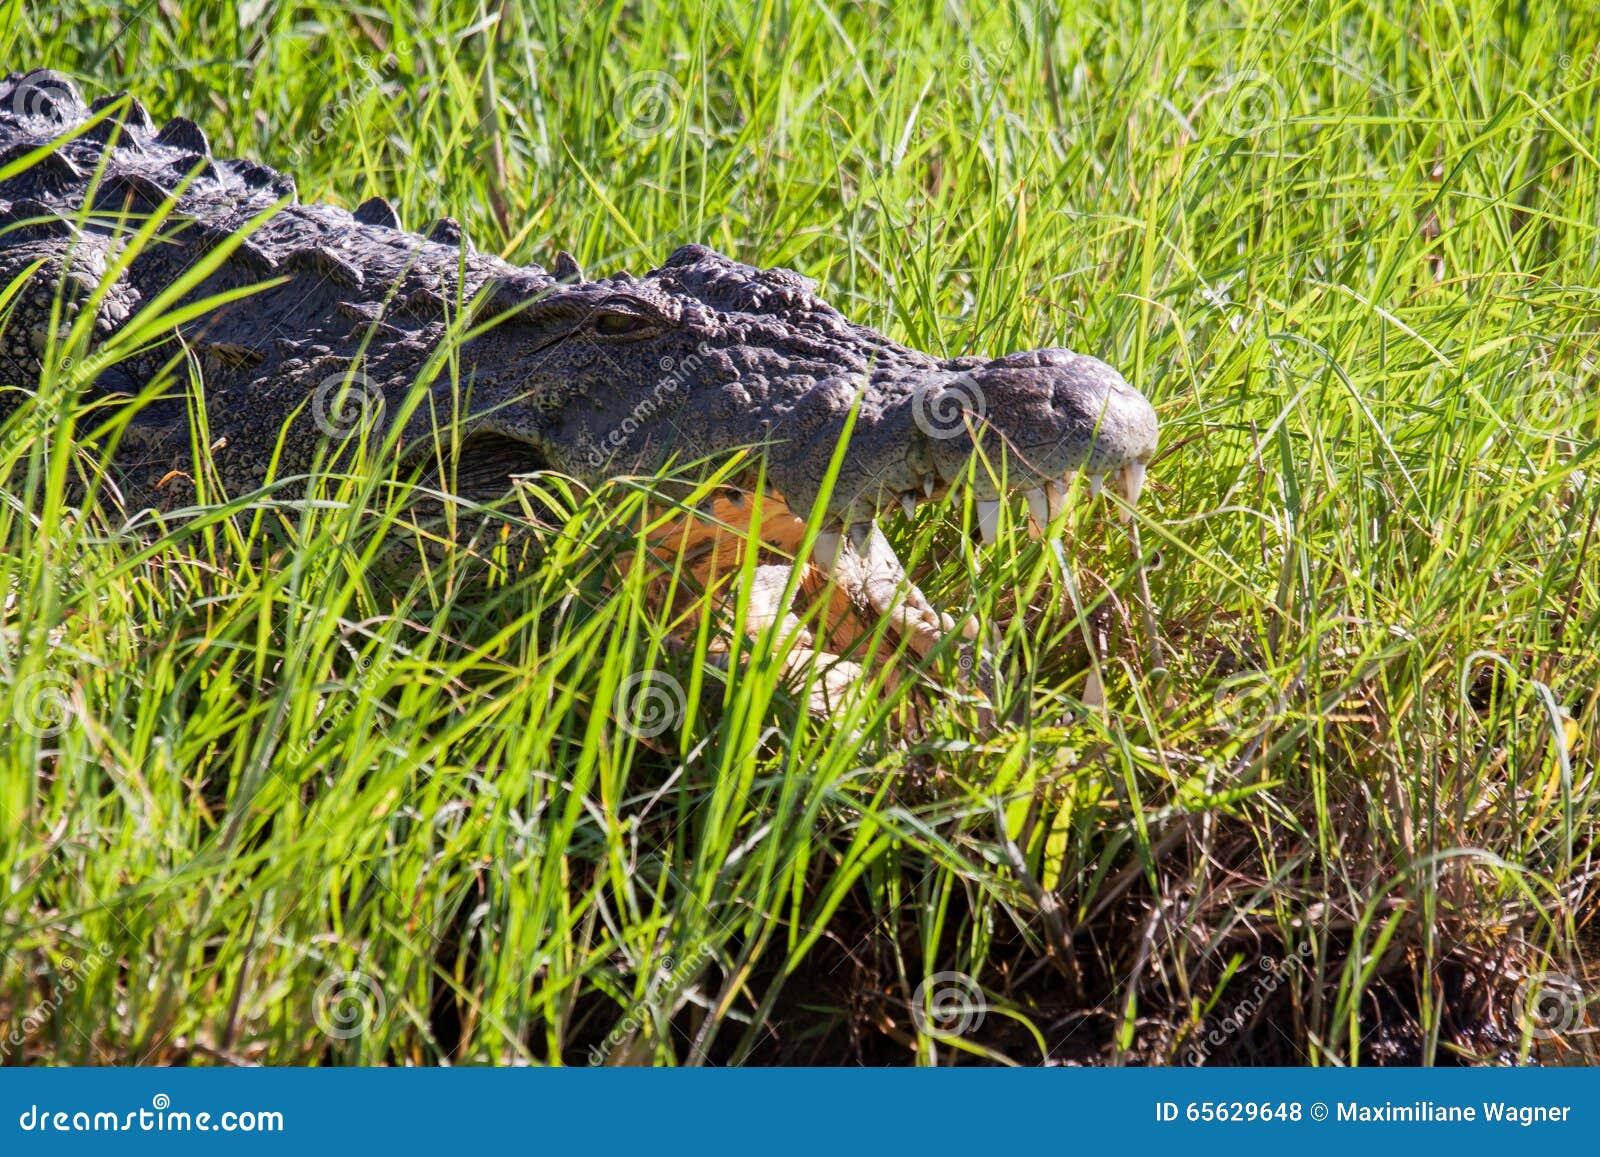 Crocodile dans l herbe, parc national de Chobe, Botswana